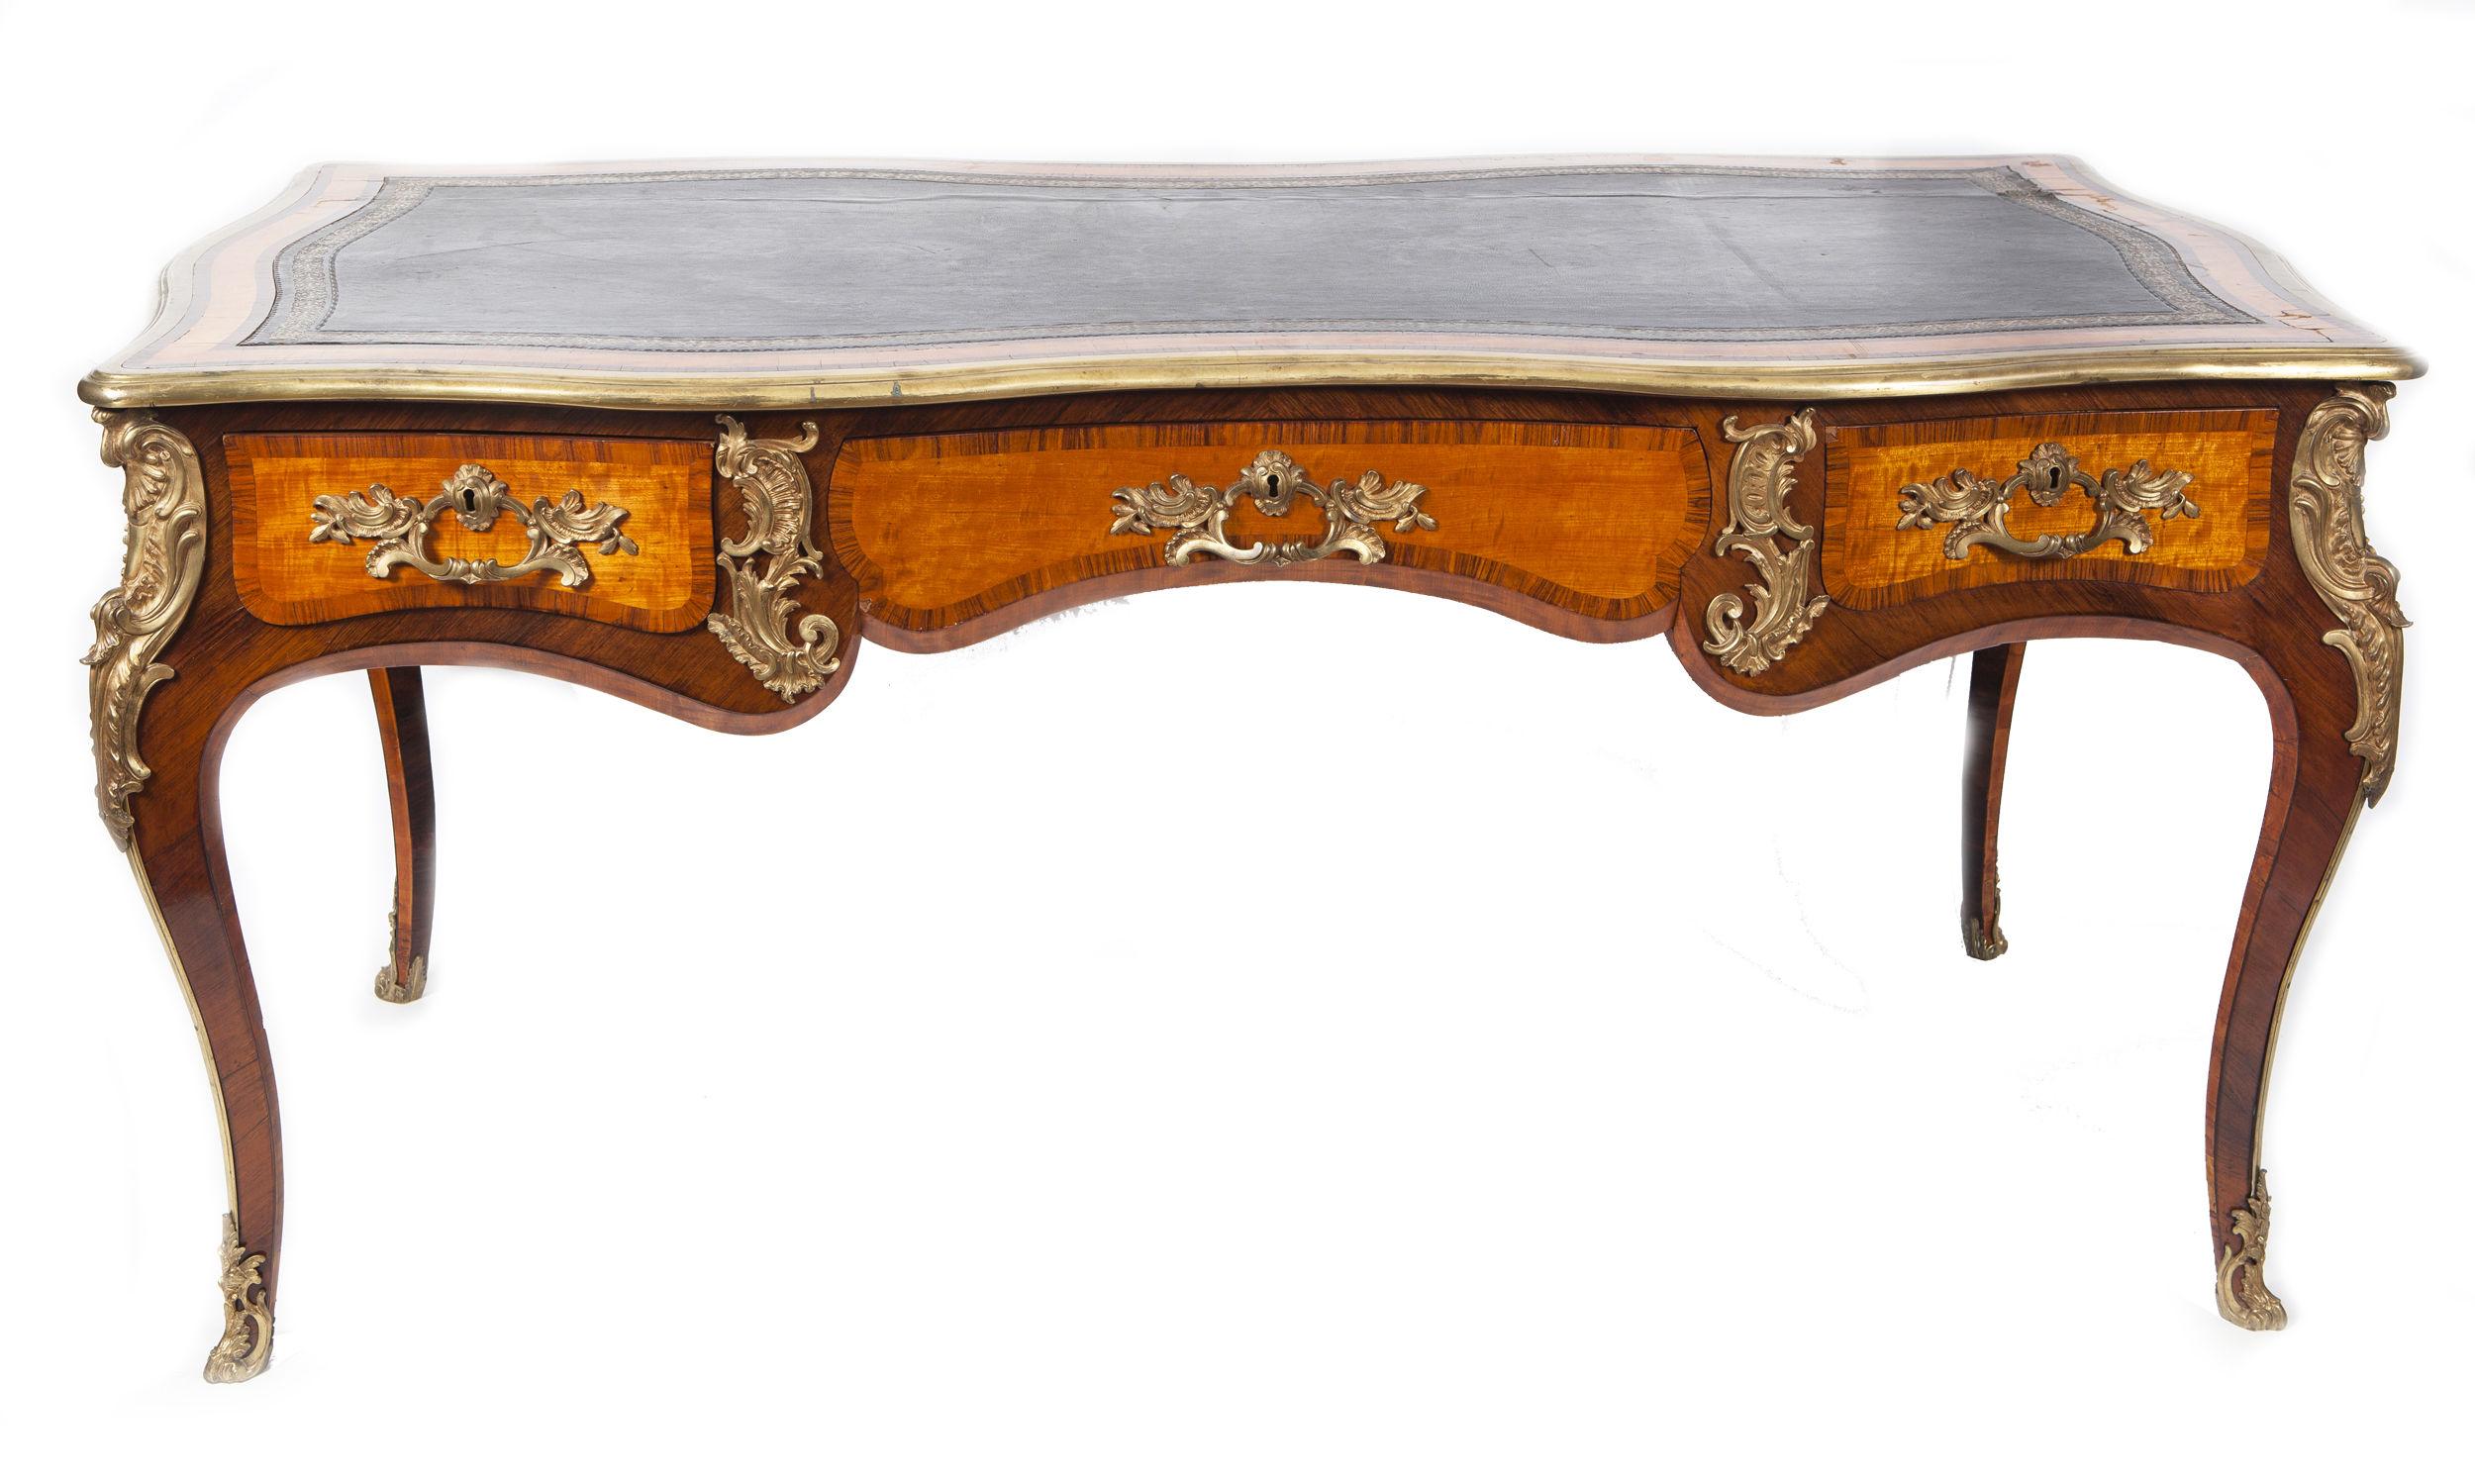 Antique bureau plat 19th century english for Bureau in english